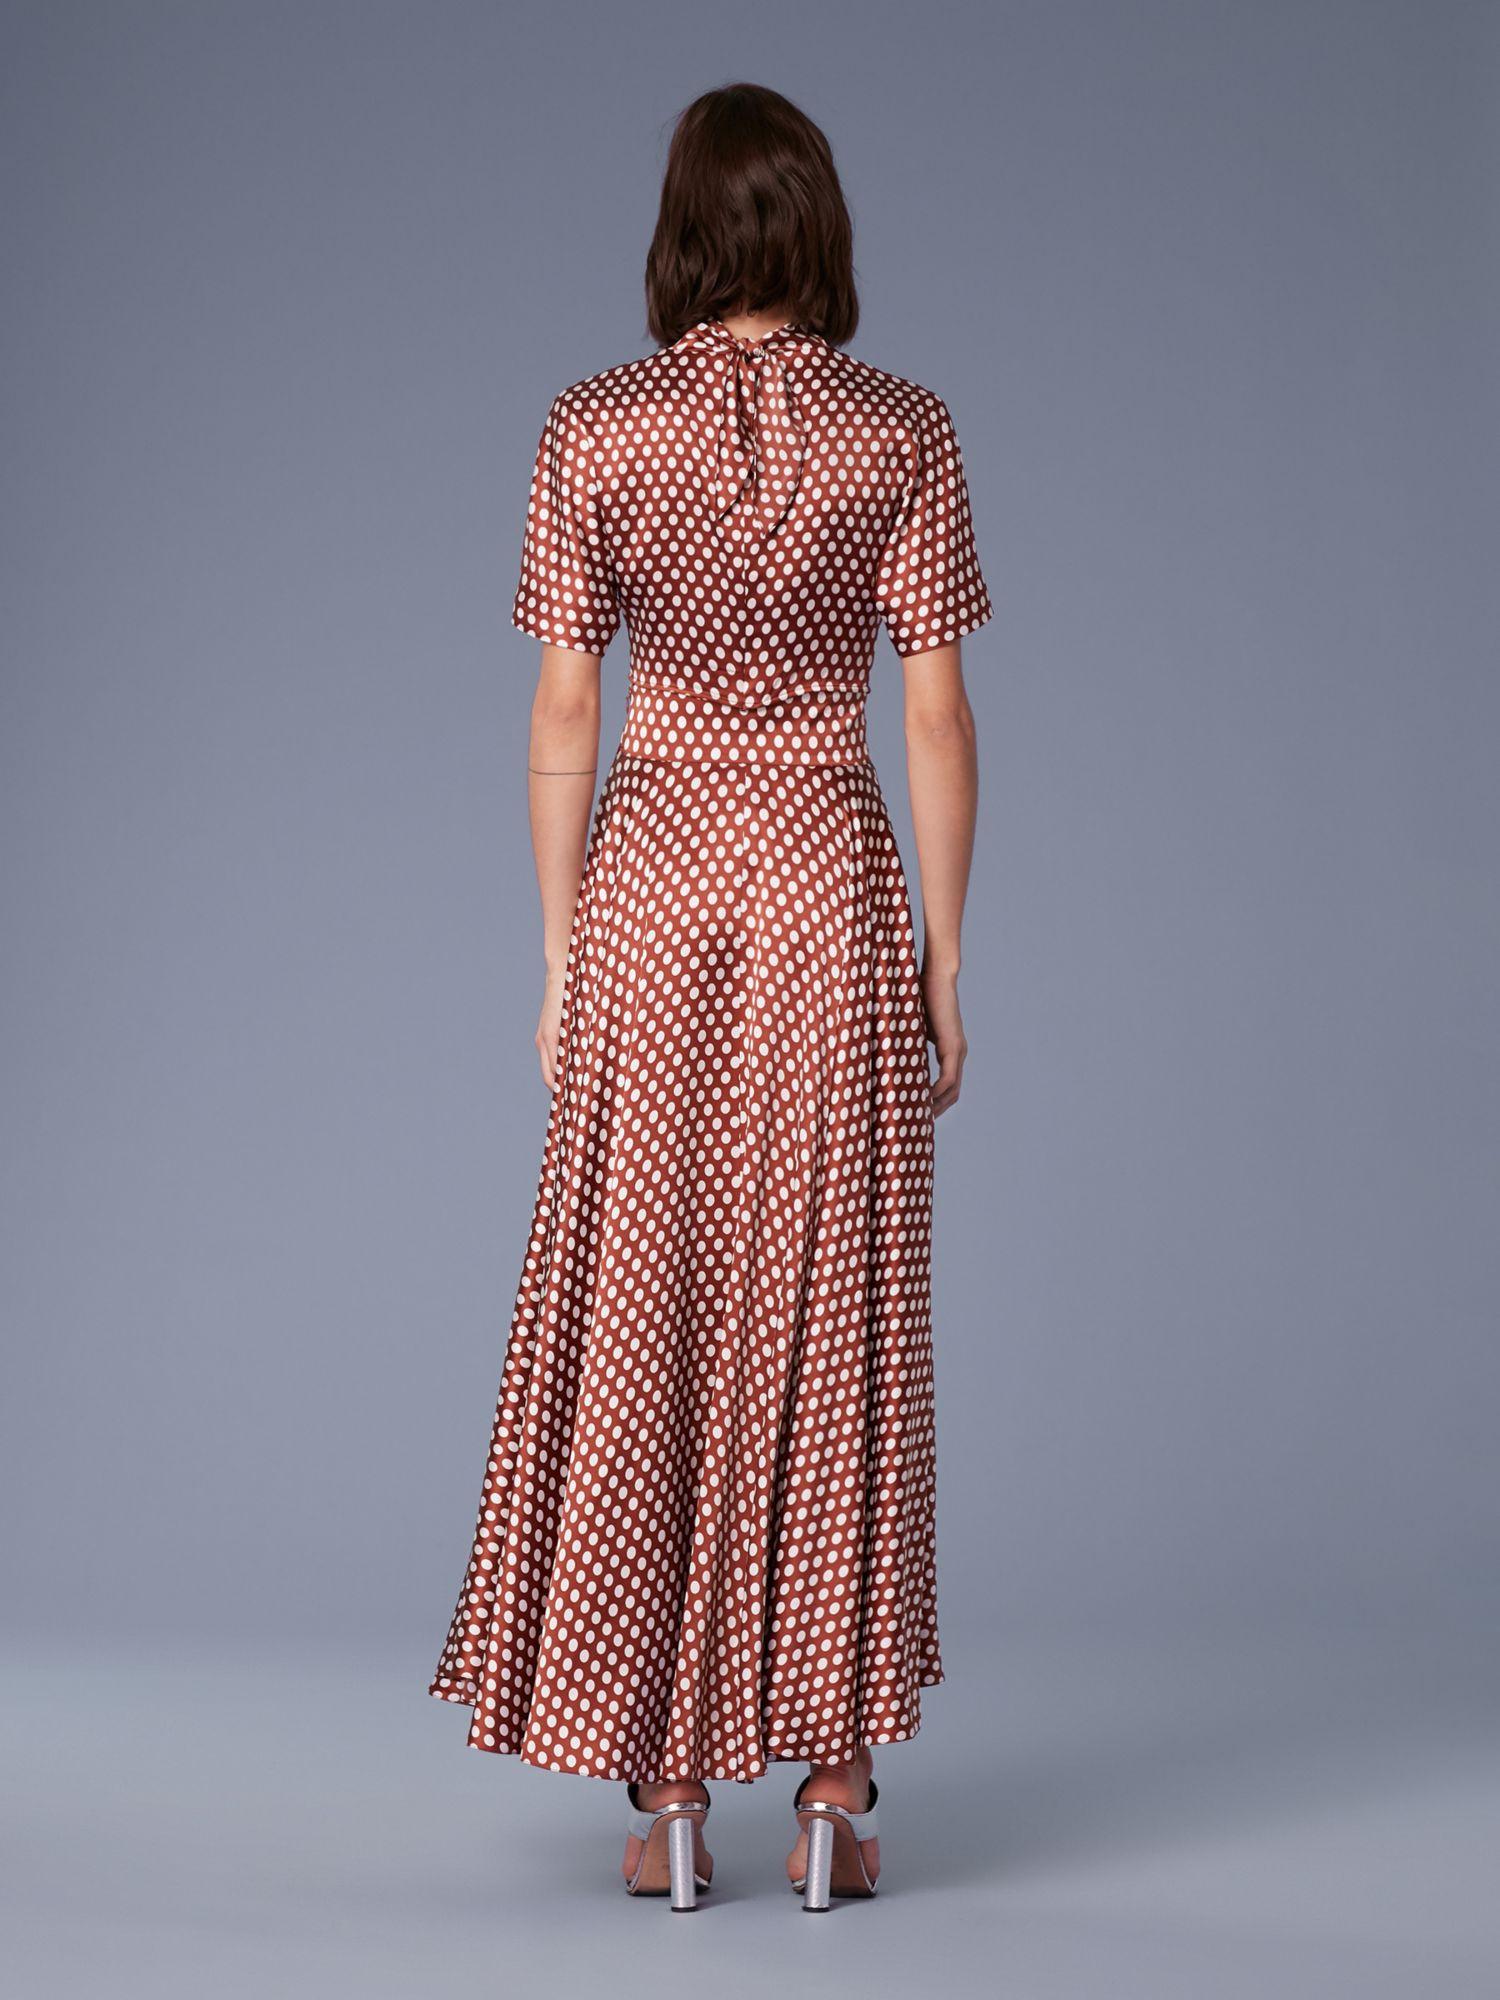 ecff6155218b4b Diane Von Furstenberg Dvf High-Waisted Draped Satin Maxi Skirt - 8 ...